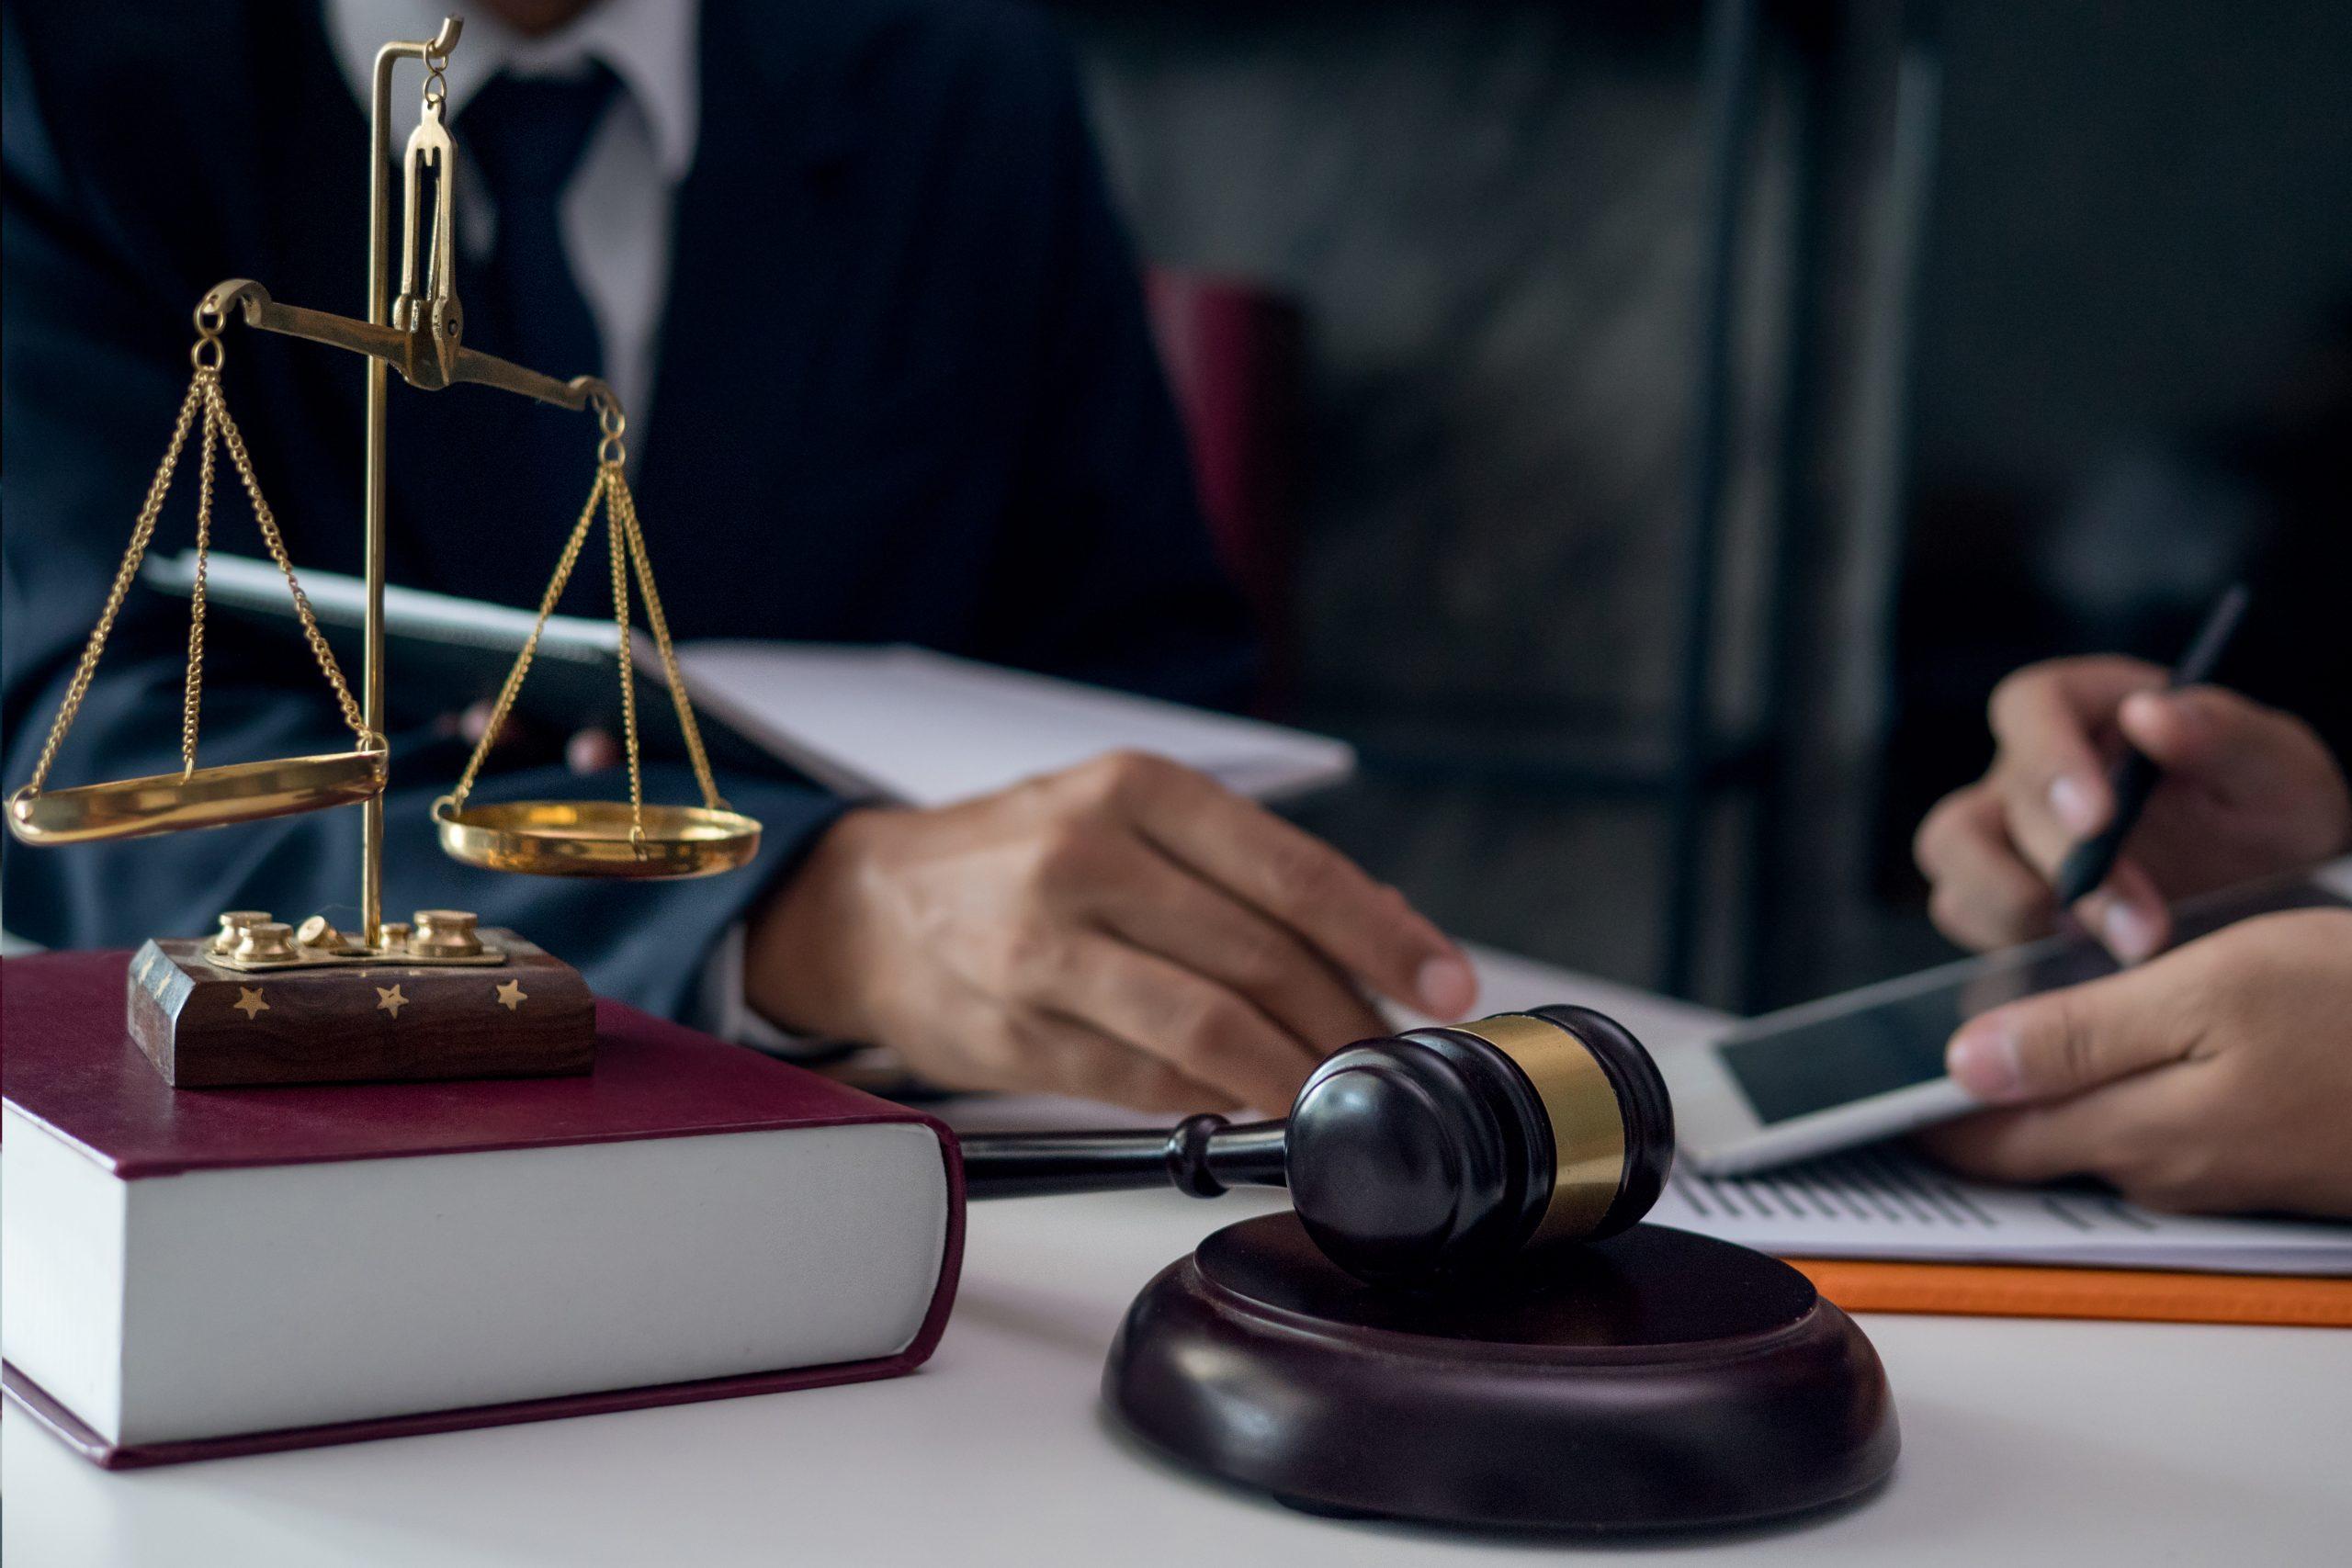 Supreme Court Plans to Hear Major Second Amendment Appeal Washington DC Legal Article Featured Image by Antonoplos & Associates